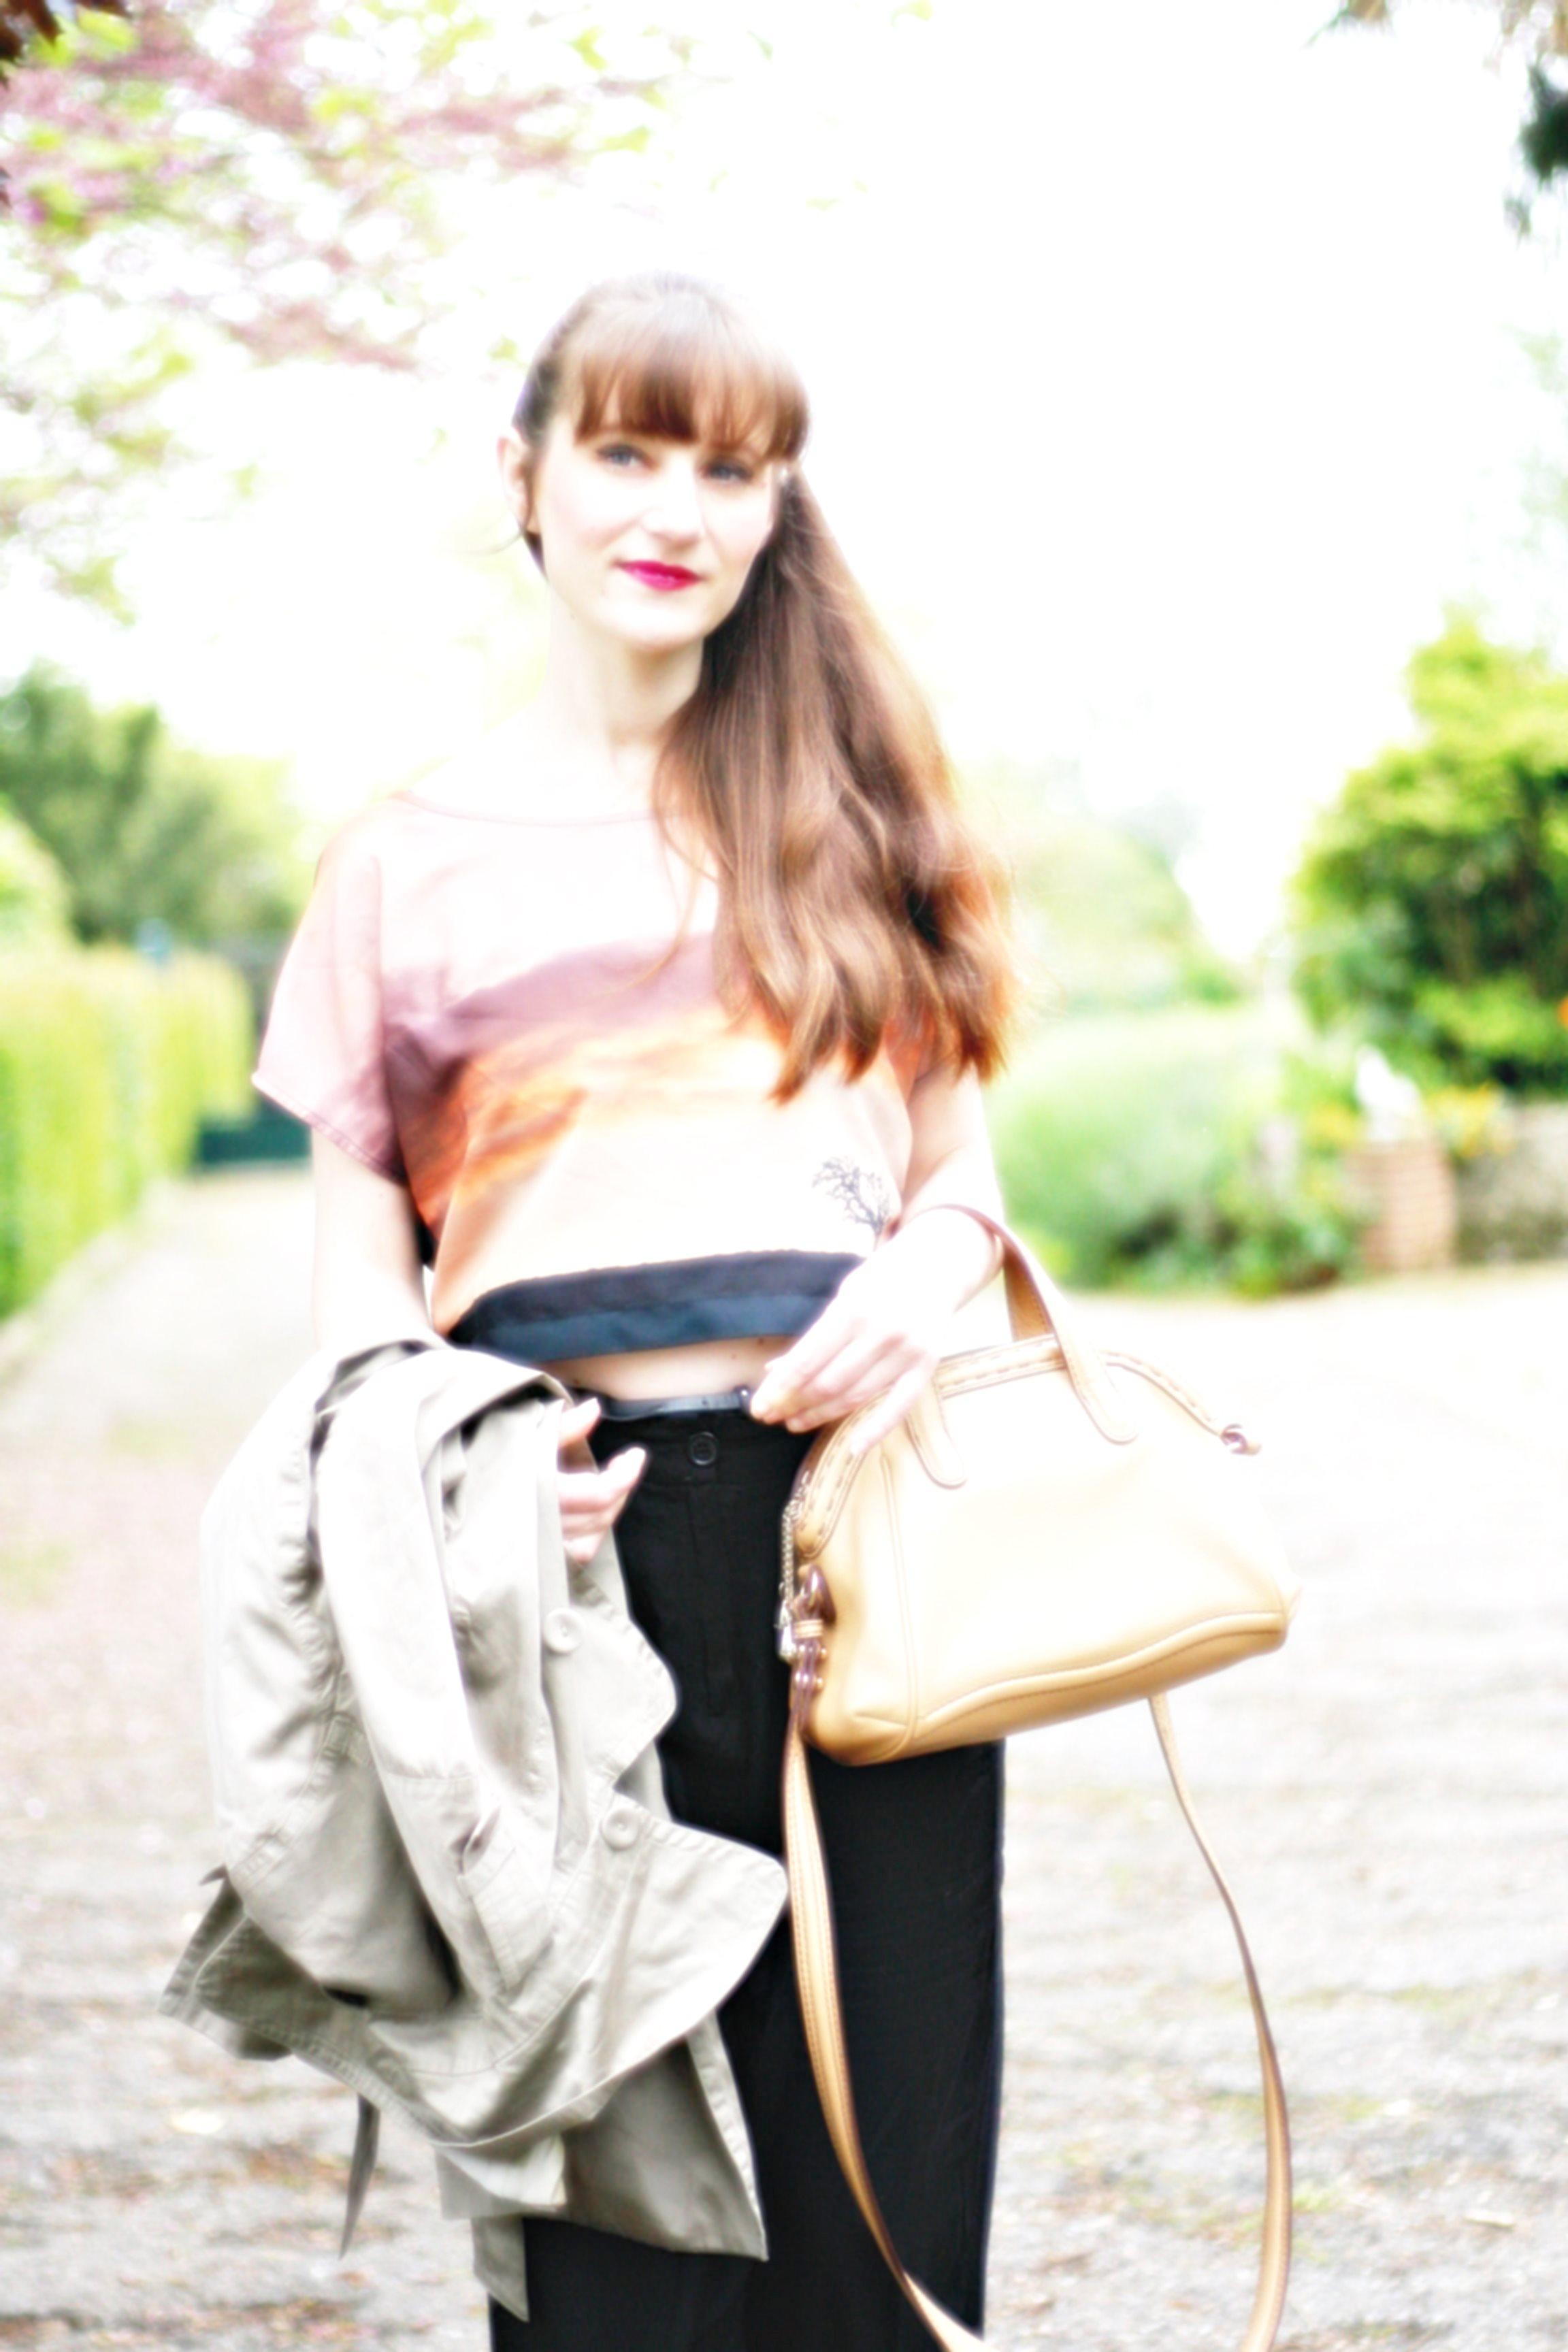 sac-lancel-blog-mode-la-charmeuse